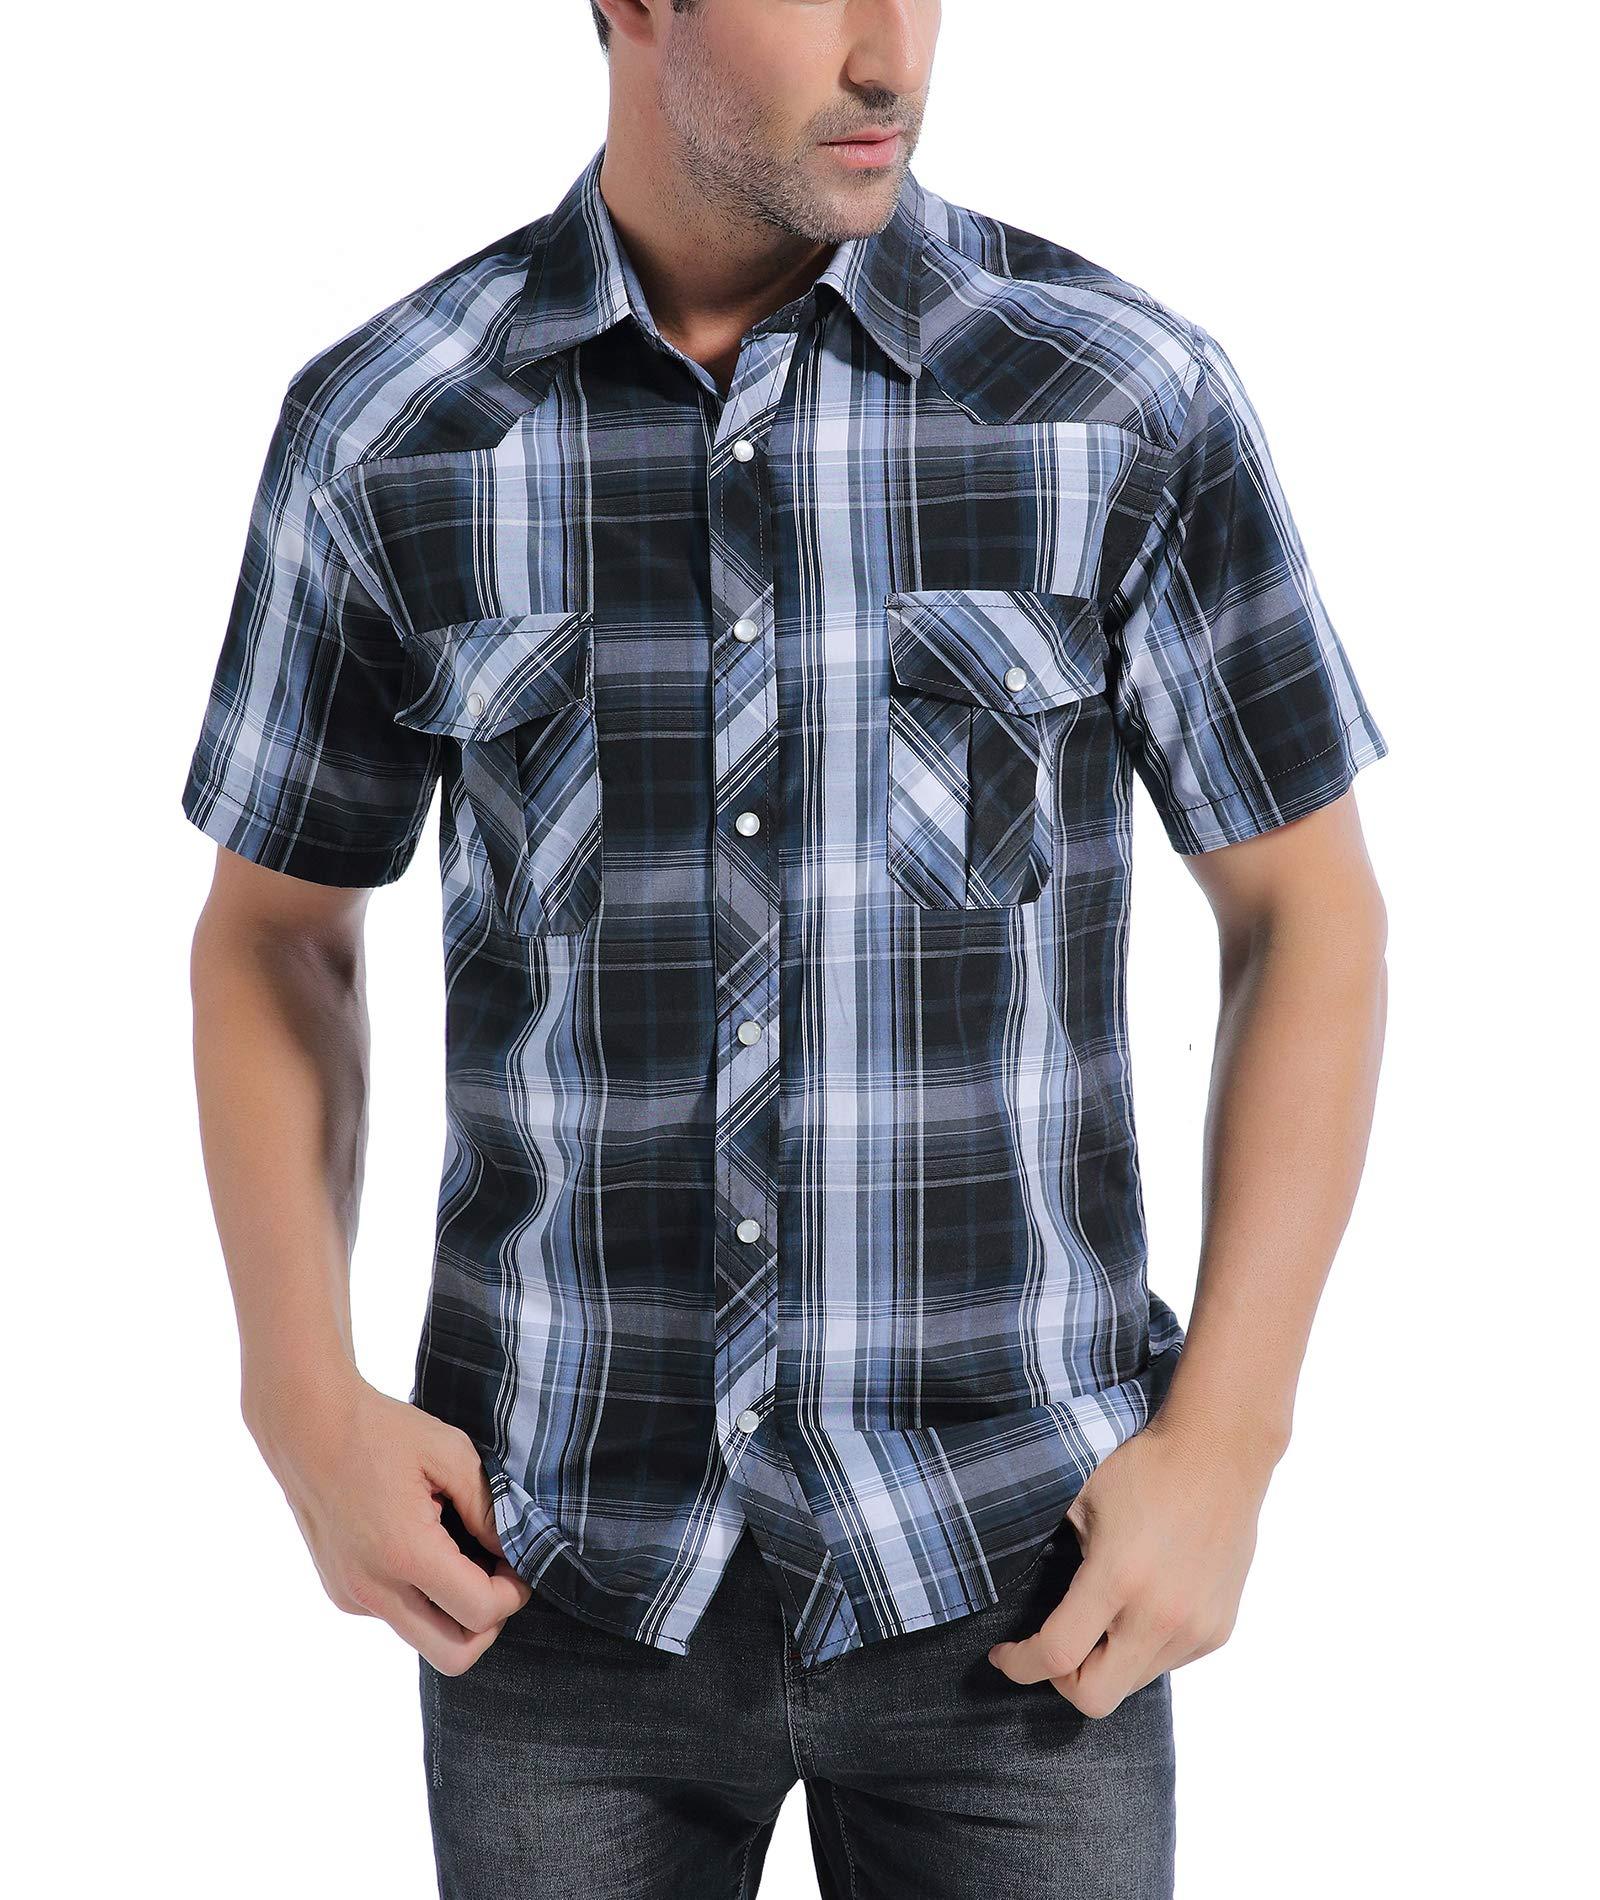 34cdf5e1c21 Coevals Club Men's Short Sleeve Casual Western Plaid Snap Buttons Shirt